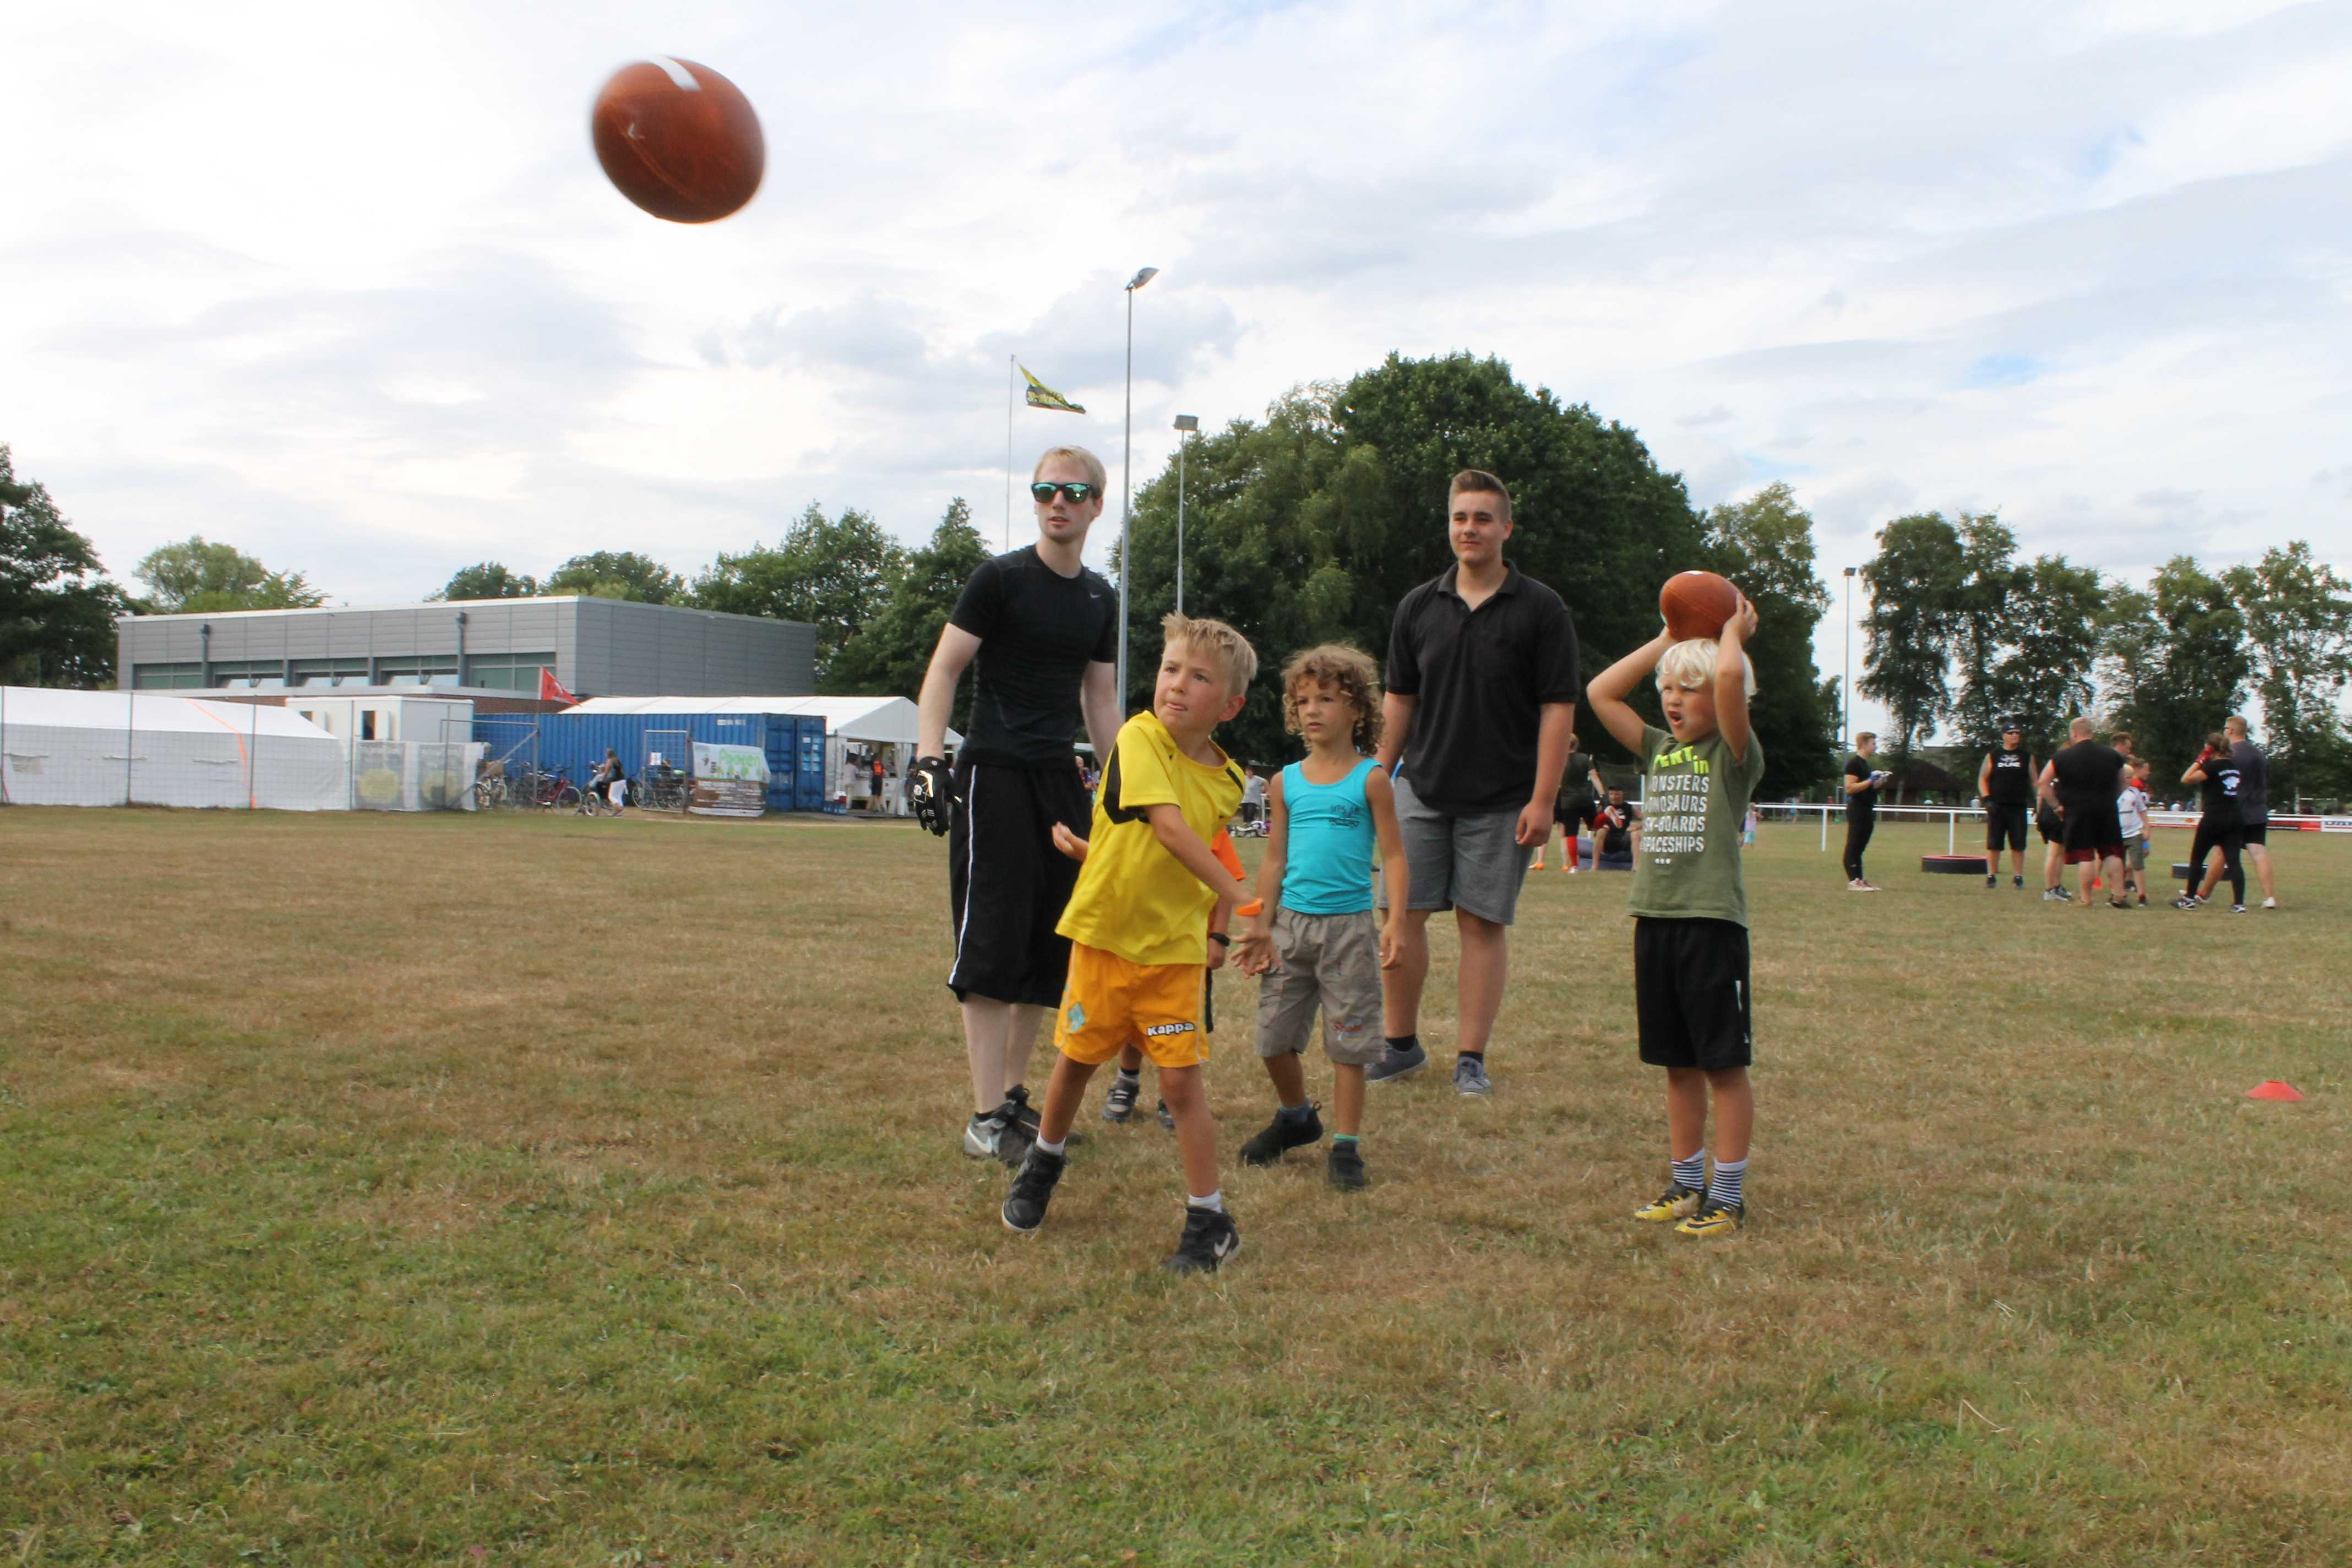 2018-07-29 Sportwoche - Sportpicknick & Football & Fußball (44)